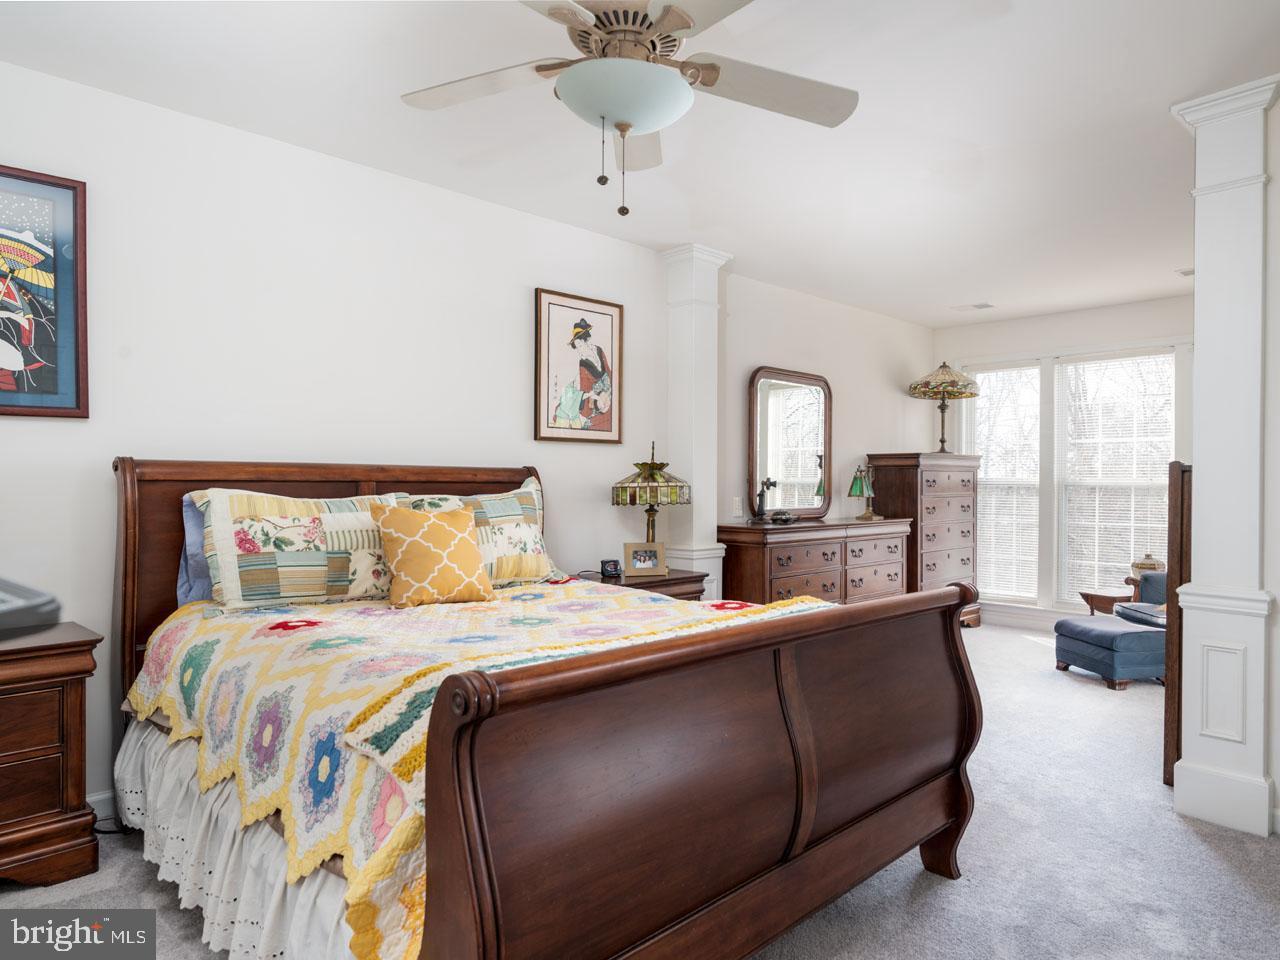 VAFX1104336-302201658808-2021-07-16-19-45-24  |   | Alexandria Delaware Real Estate For Sale | MLS# Vafx1104336  - Best of Northern Virginia